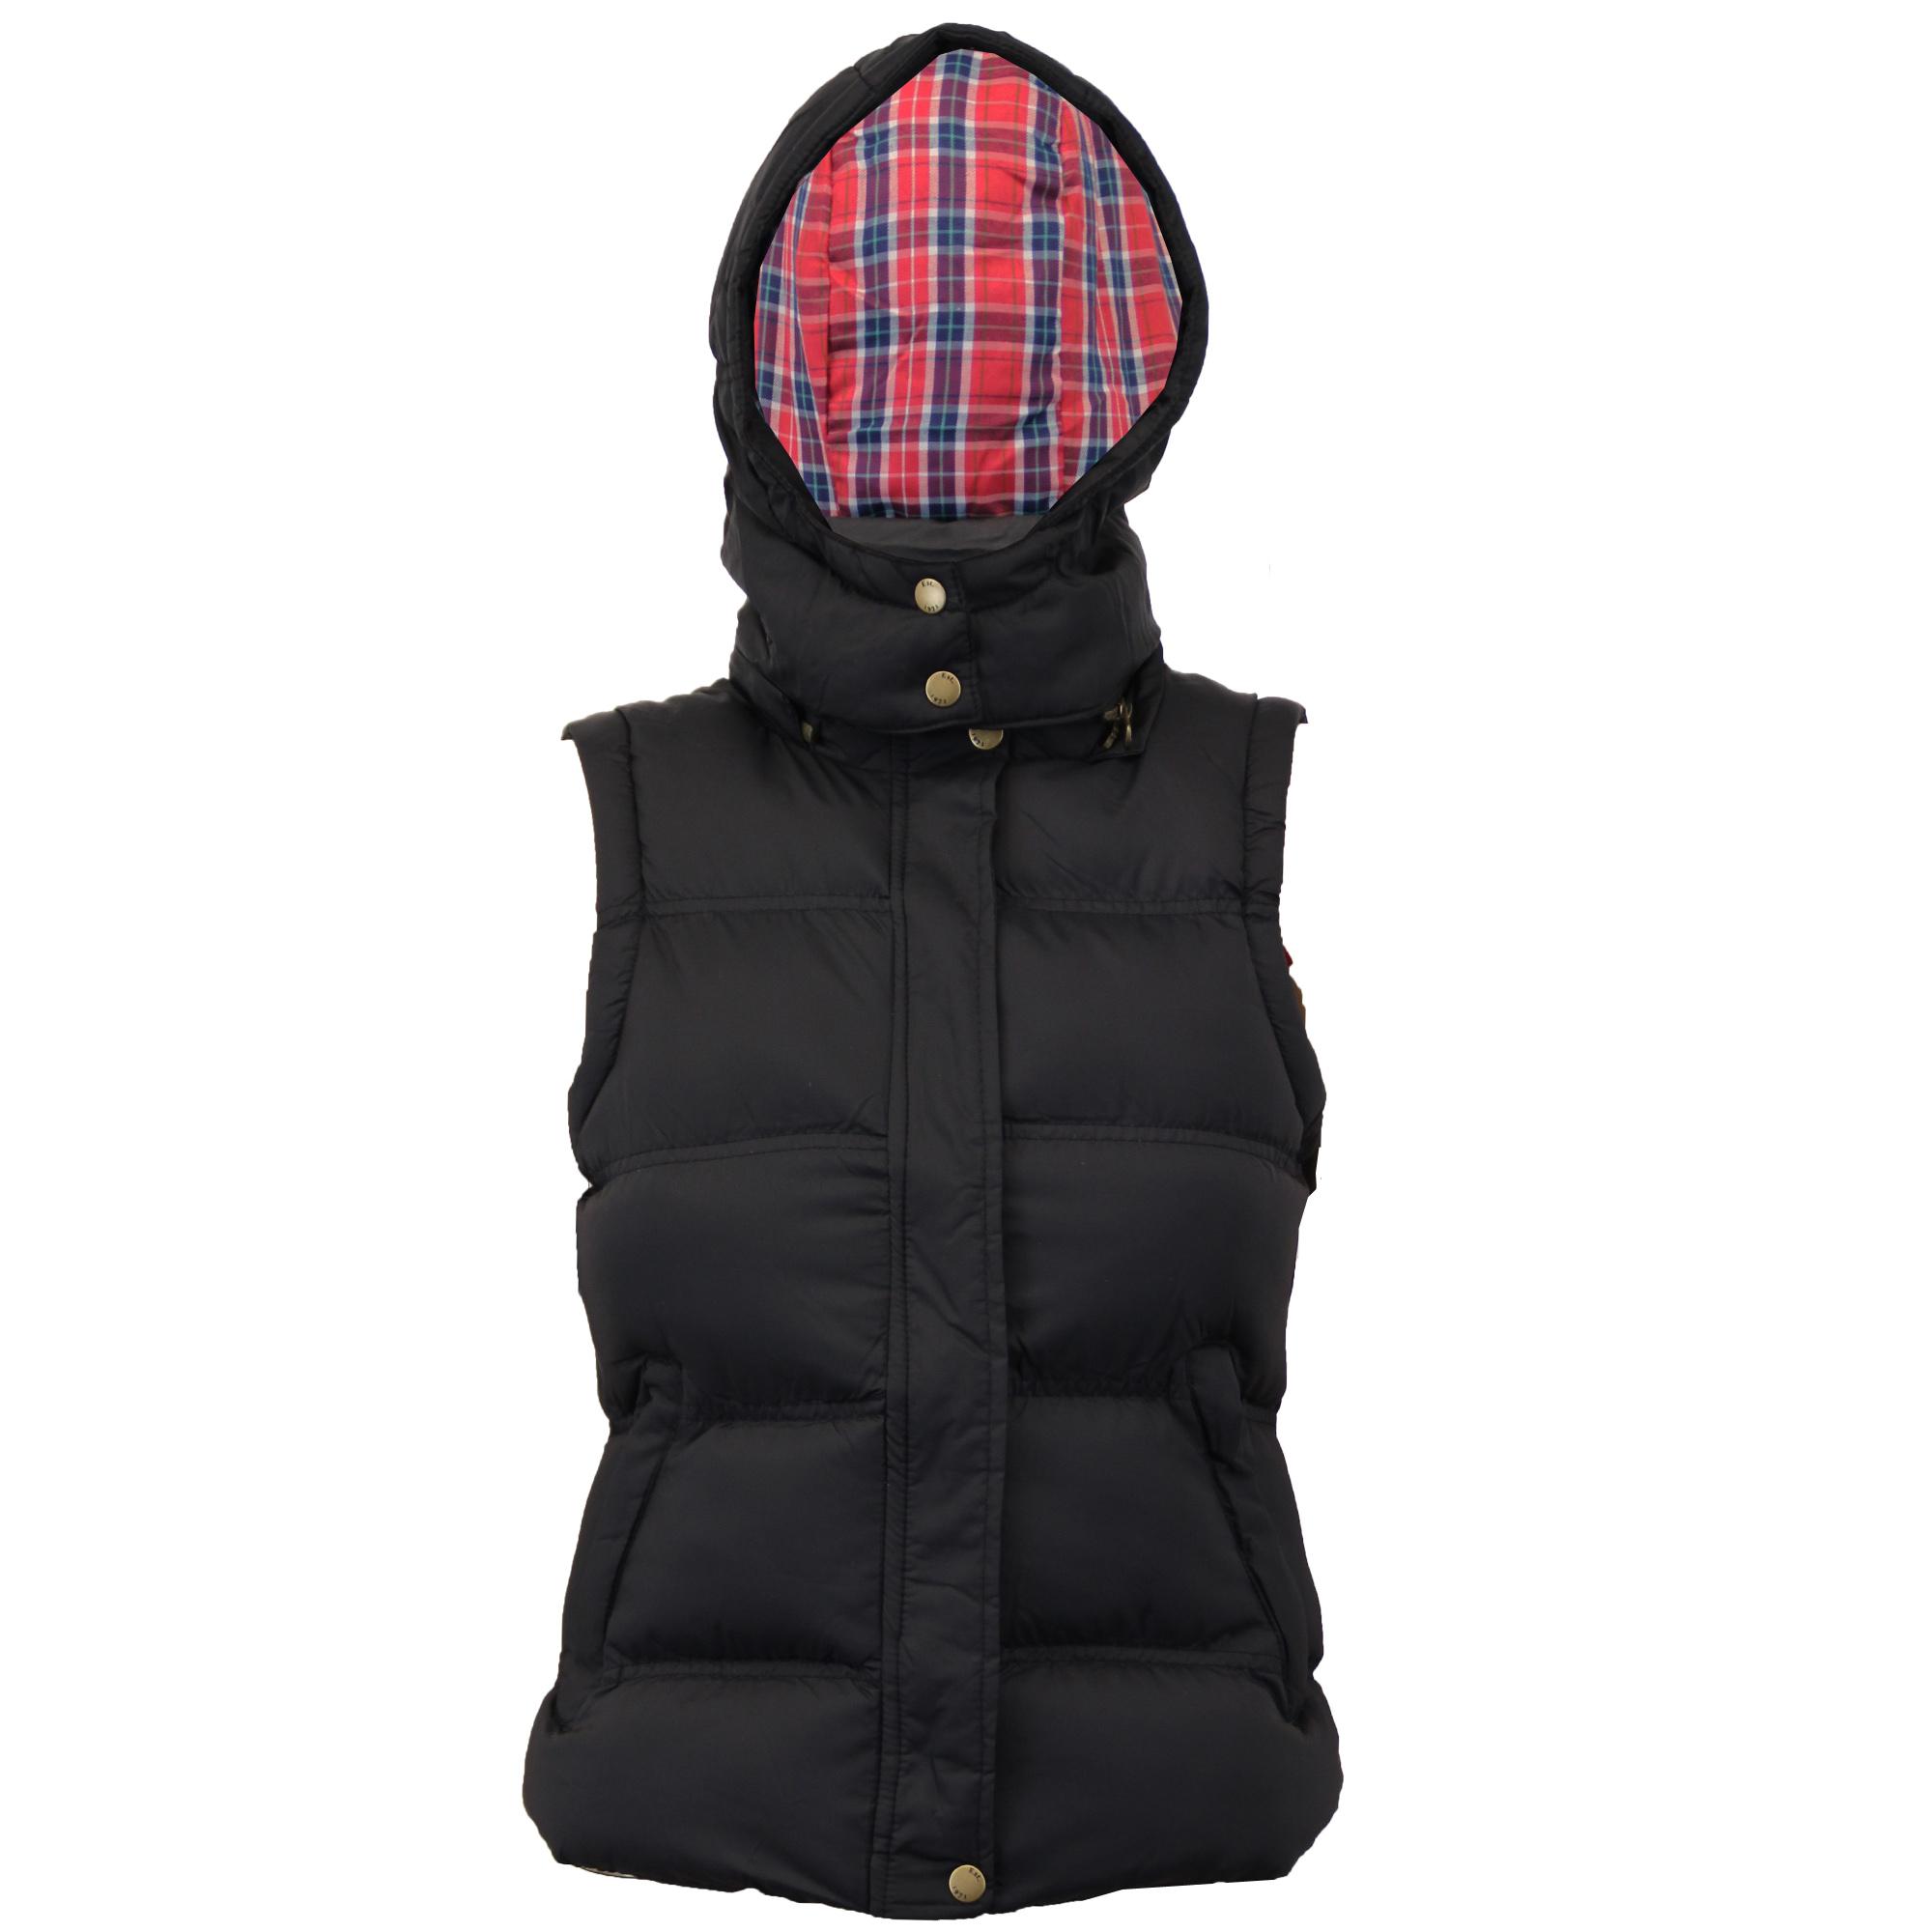 Womens gilet jacket